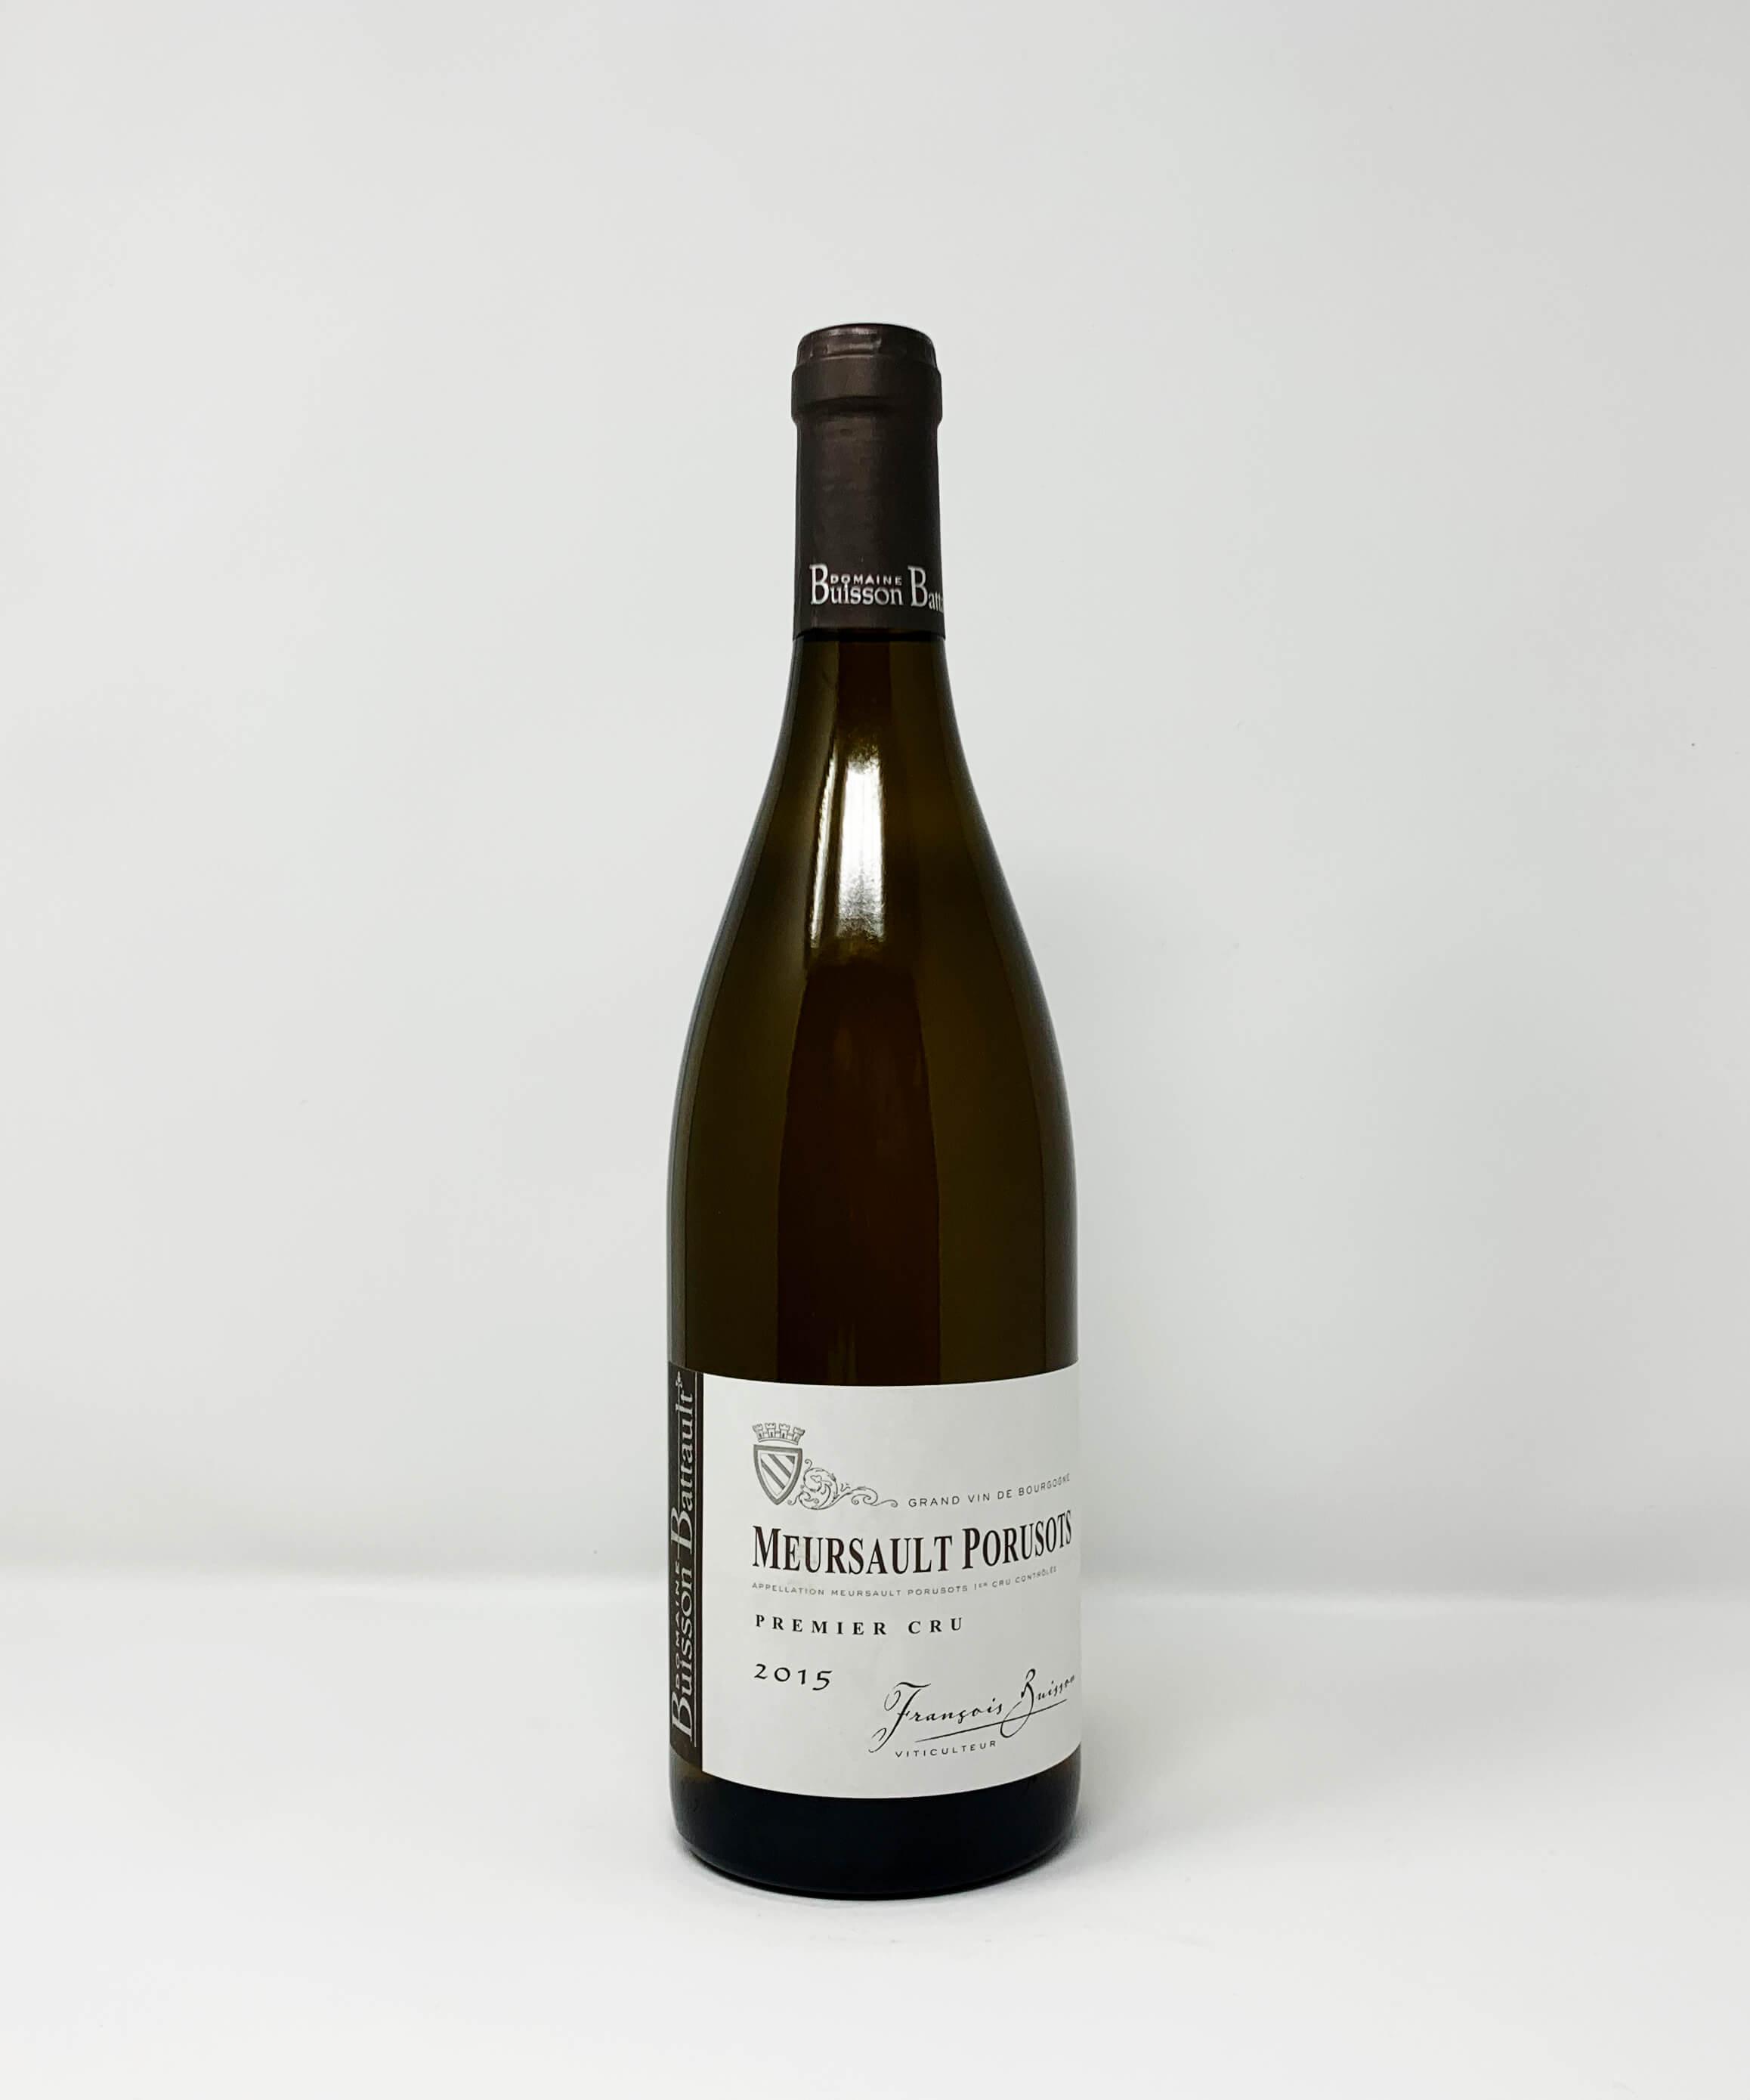 Francois Buisson, Meursault, Porusots